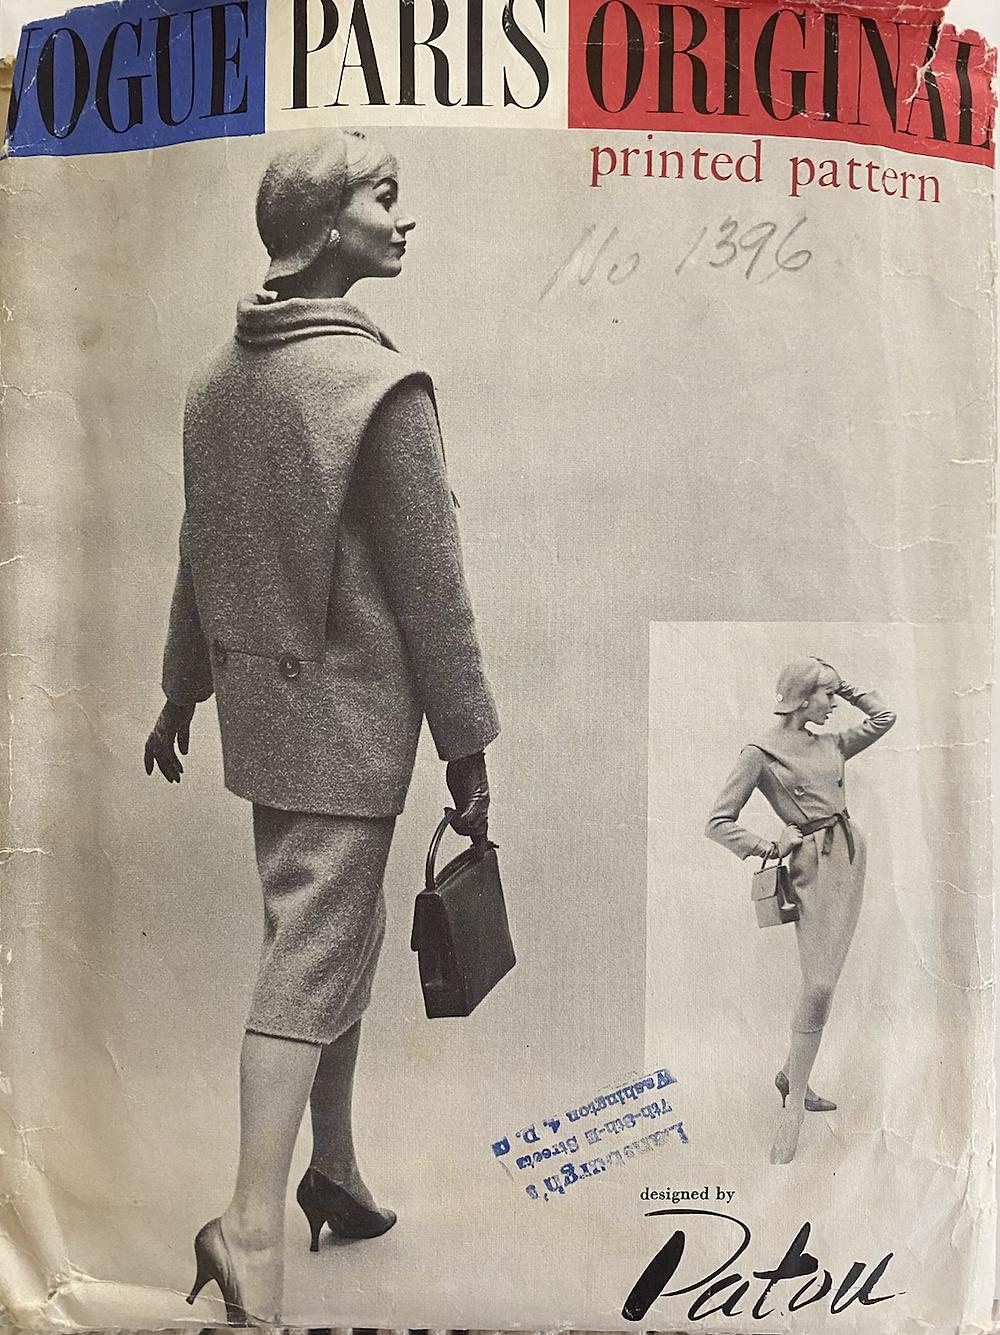 Patou Sewing Pattern Vogue Paris Original #1396 by Marc Bohan, circa 1957